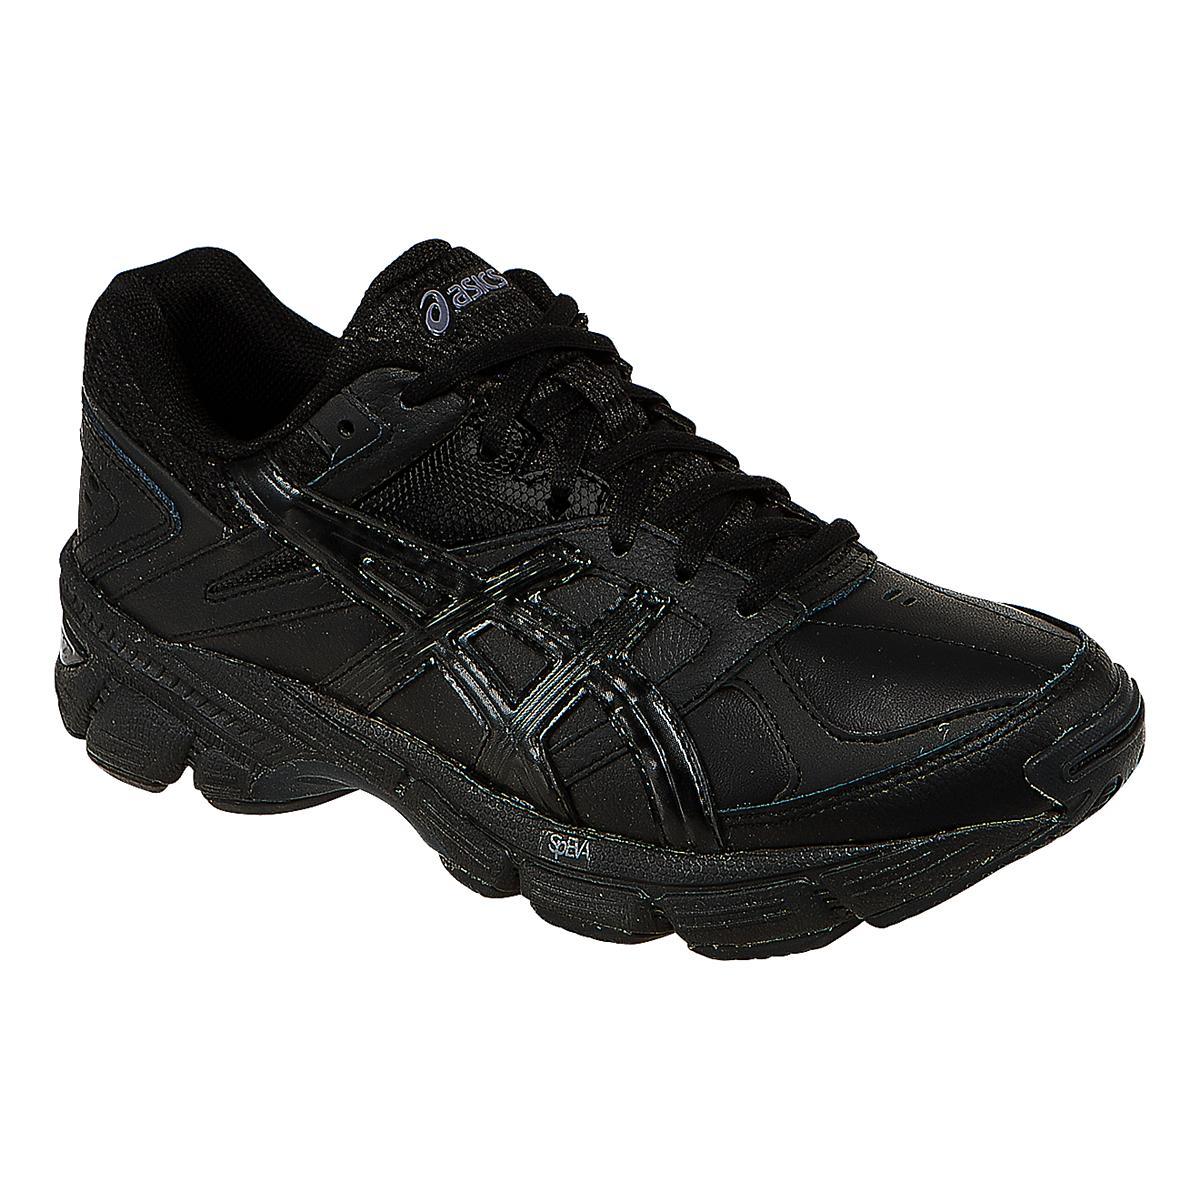 Especialista acoso Ausencia  Womens ASICS GEL-190 TR Cross Training Shoe at Road Runner Sports